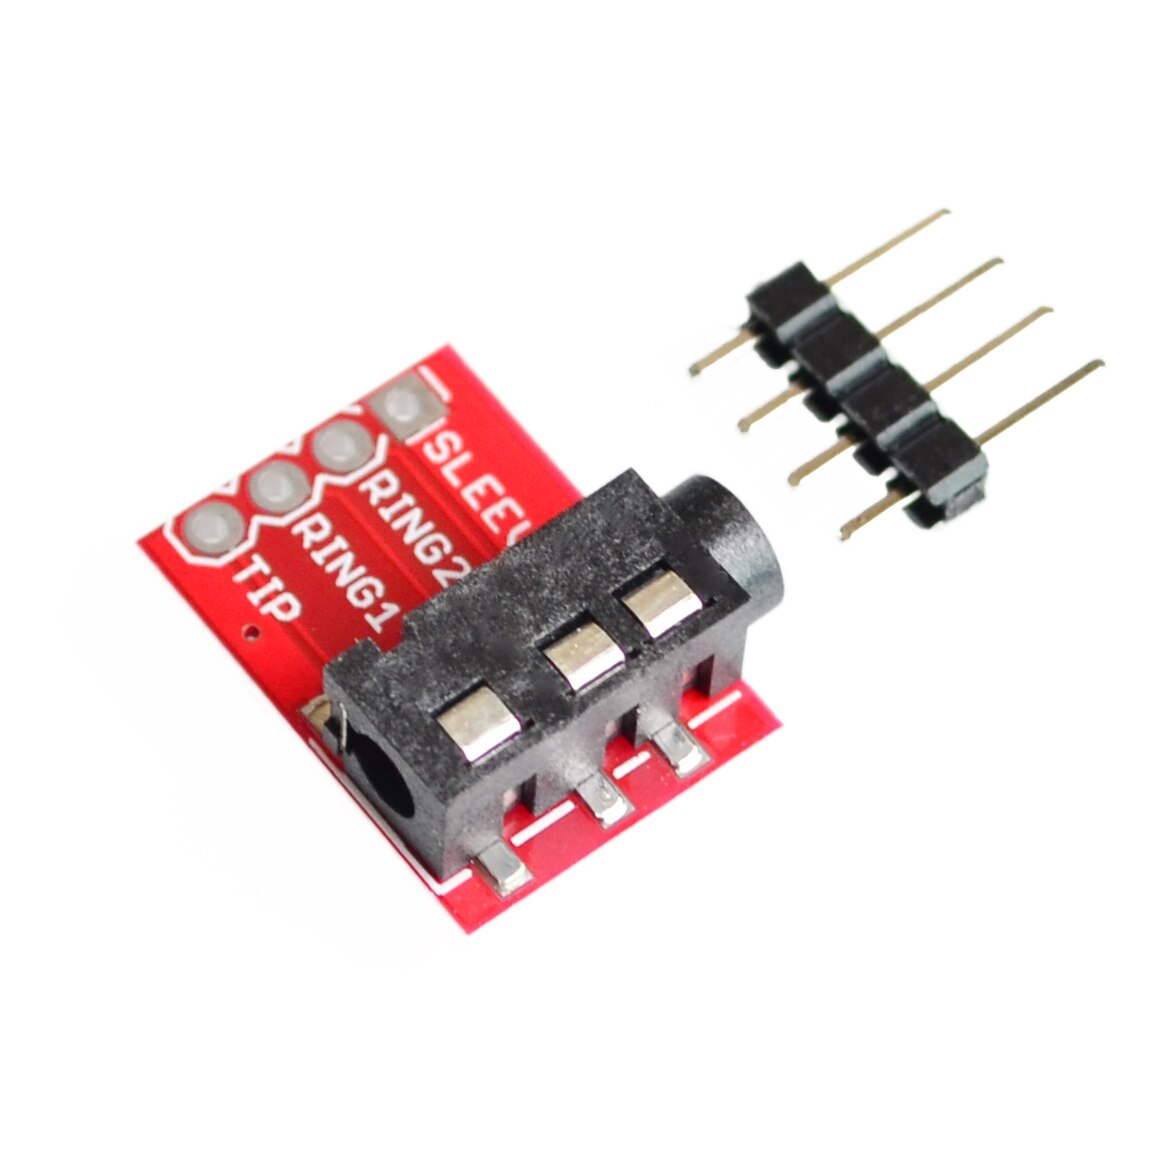 10 unids/lote TRRS 3,5mm auriculares estéreo MP3 audio video micrófono módulos de interfaz de bloque